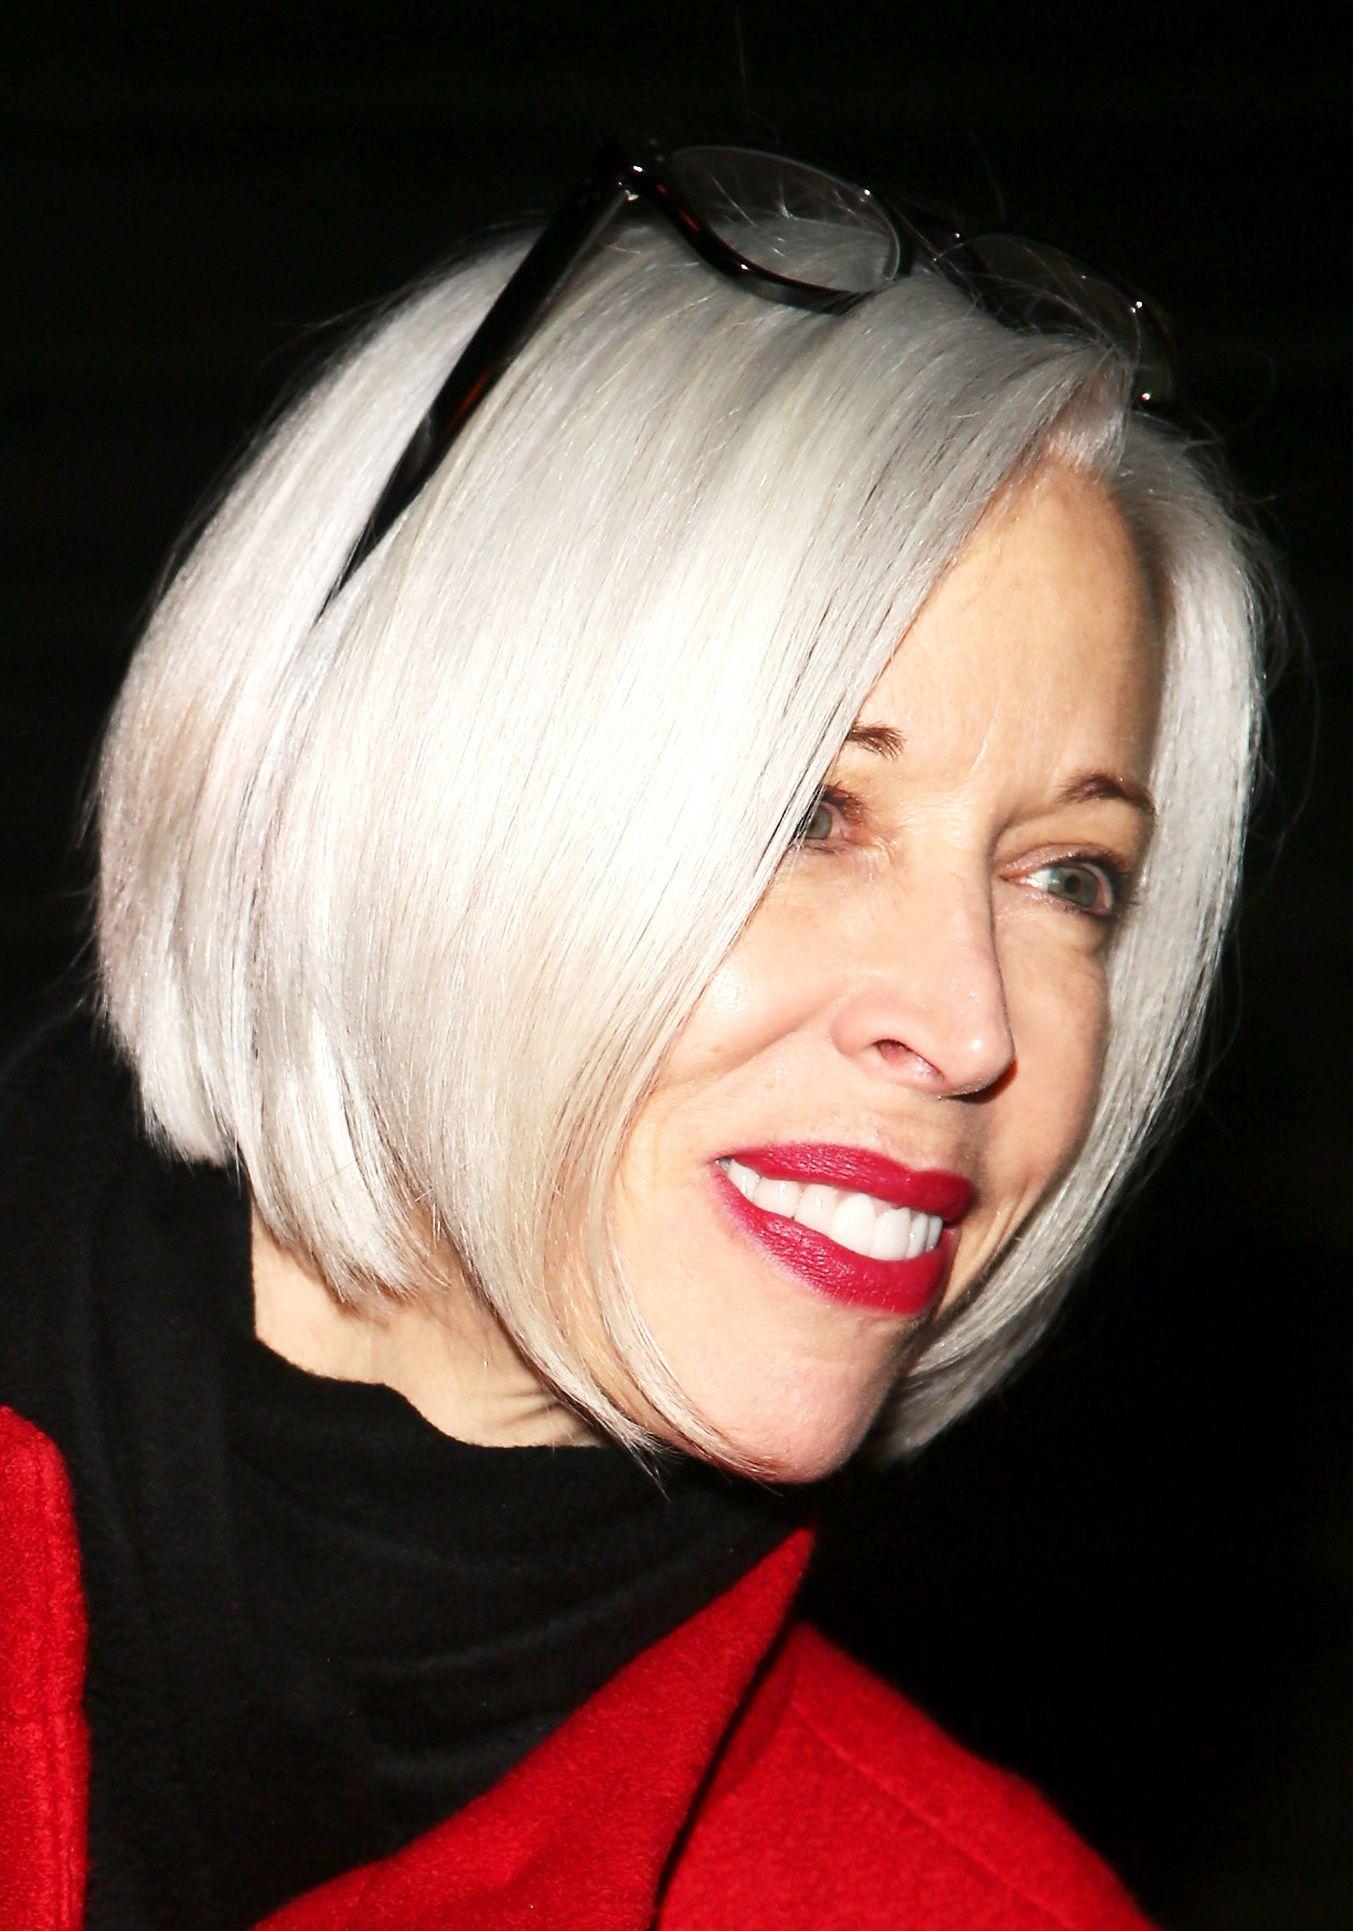 Pin by Kelly Kopp on Haircut ideas Coiffure femme 60 ans